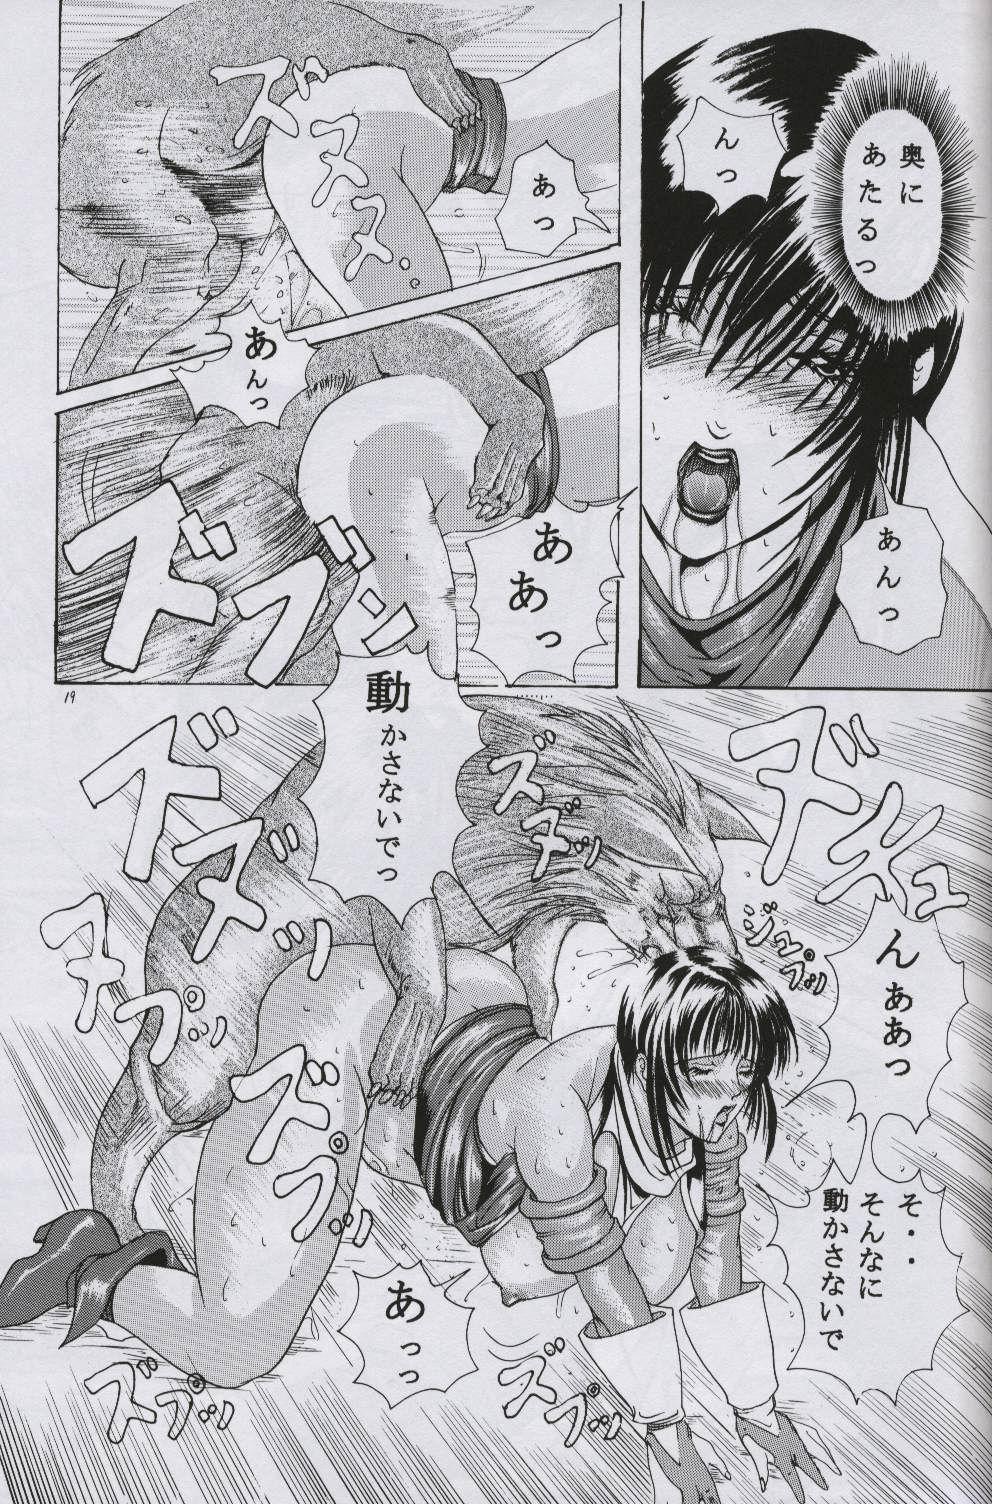 [LUCRETiA (Hiichan)] Ken-Jyuu Retouch Version - Le sexe dur avec l'animal. numero:03 (Samurai Spirits) 17